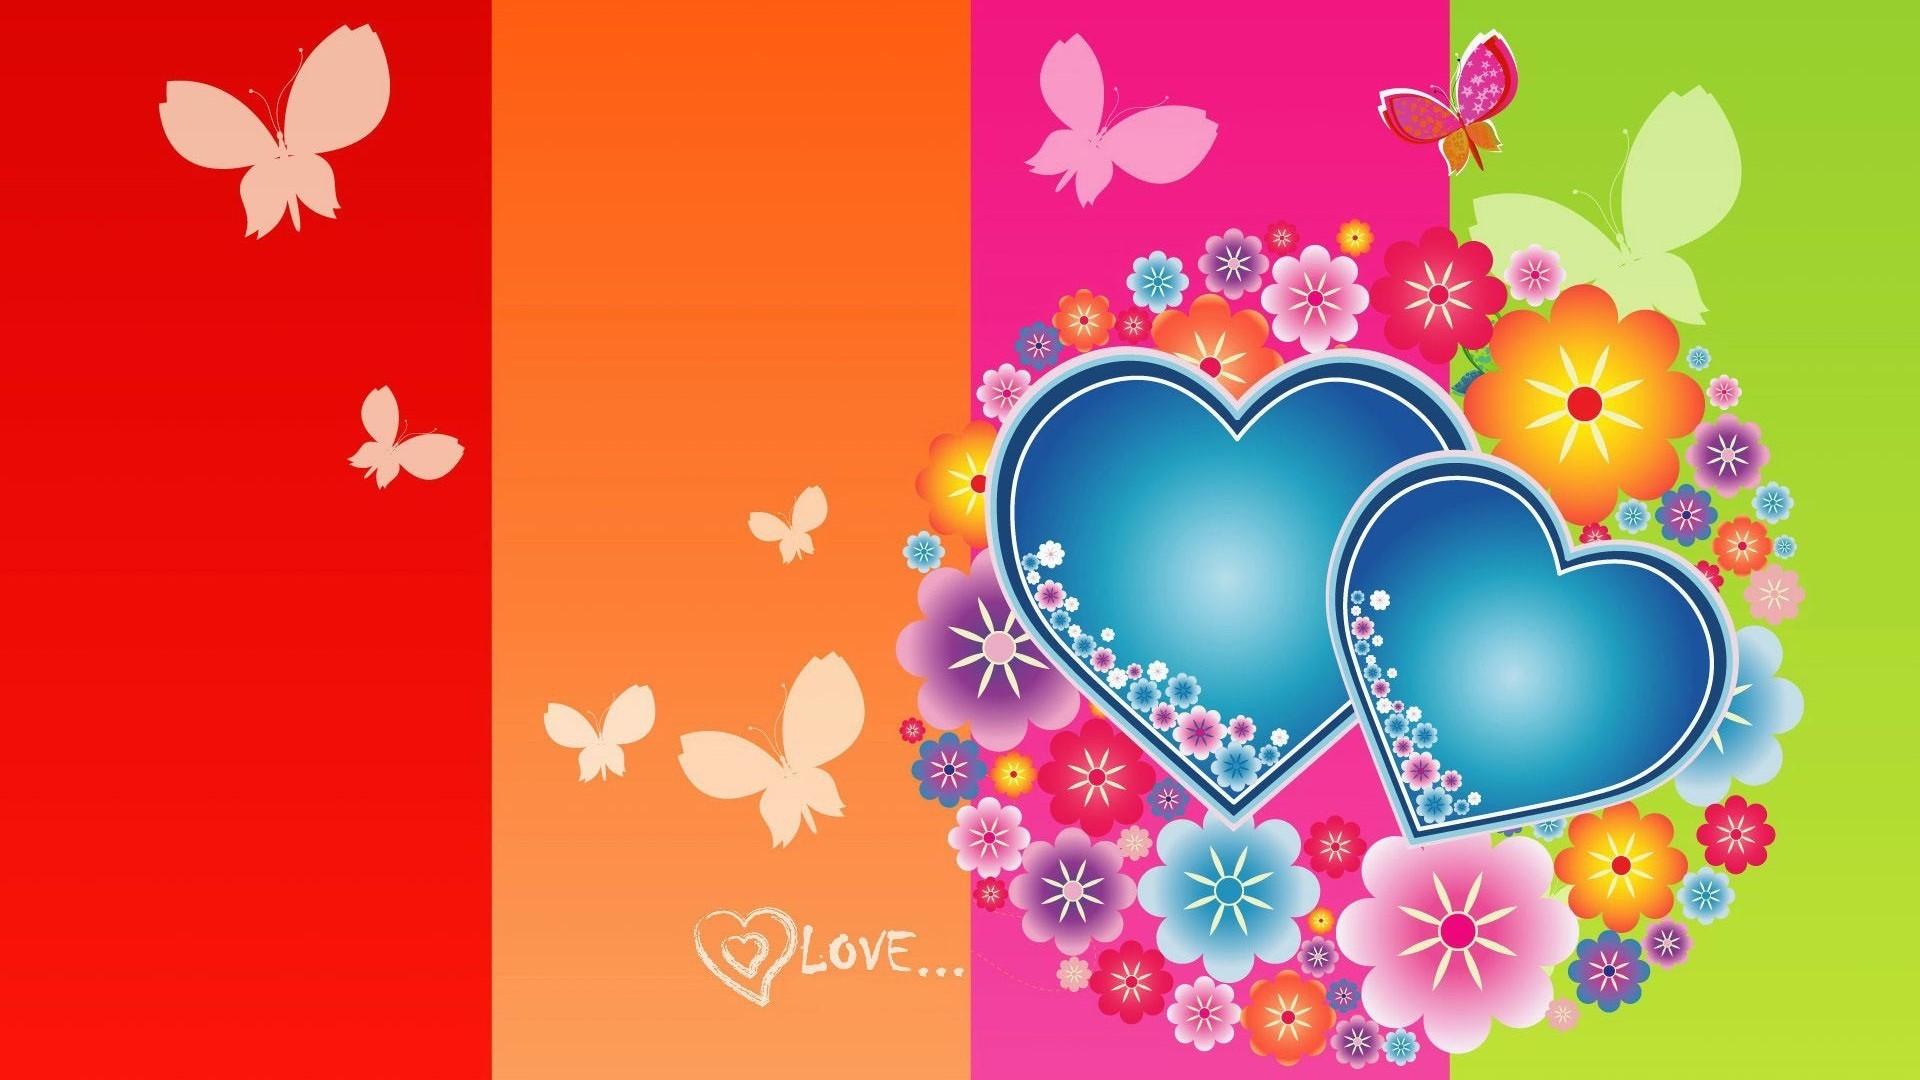 cute valentines day hd desktop wallpaper   Cute Wallpapers Desktop    Pinterest   Hd desktop and Wallpaper desktop